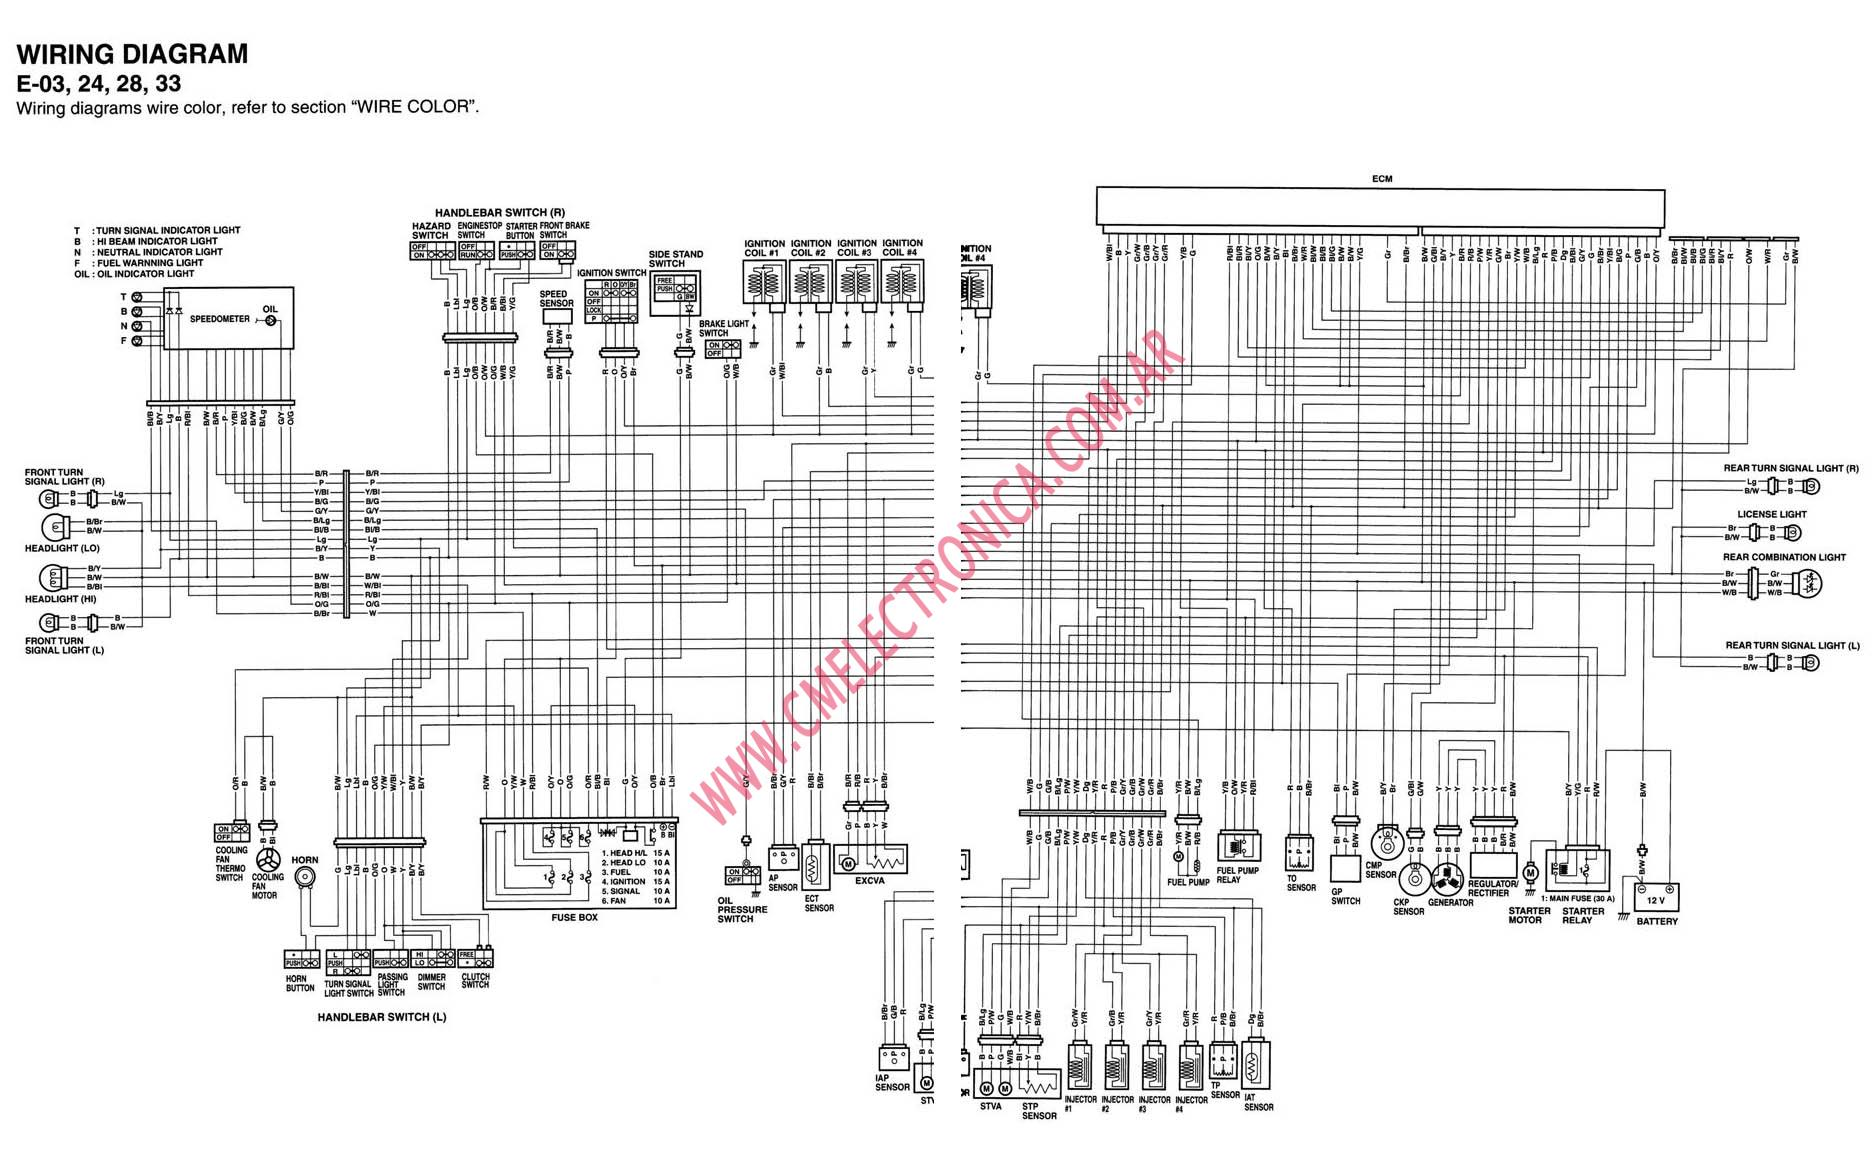 k8 wiring diagram with Suzuki Gsxr 1000 K6 Wiring Diagram on Sohc Honda Cb750 Chopper Wiring Diagram moreover Baby Stroller Wheel Parts in addition Suzuki Gsxr 1000 K6 Wiring Diagram additionally 2008 Suzuki Gsx R600 Wiring Harness Assembly additionally 2007 Suzuki Dr650se Oil Cooler Assembly.